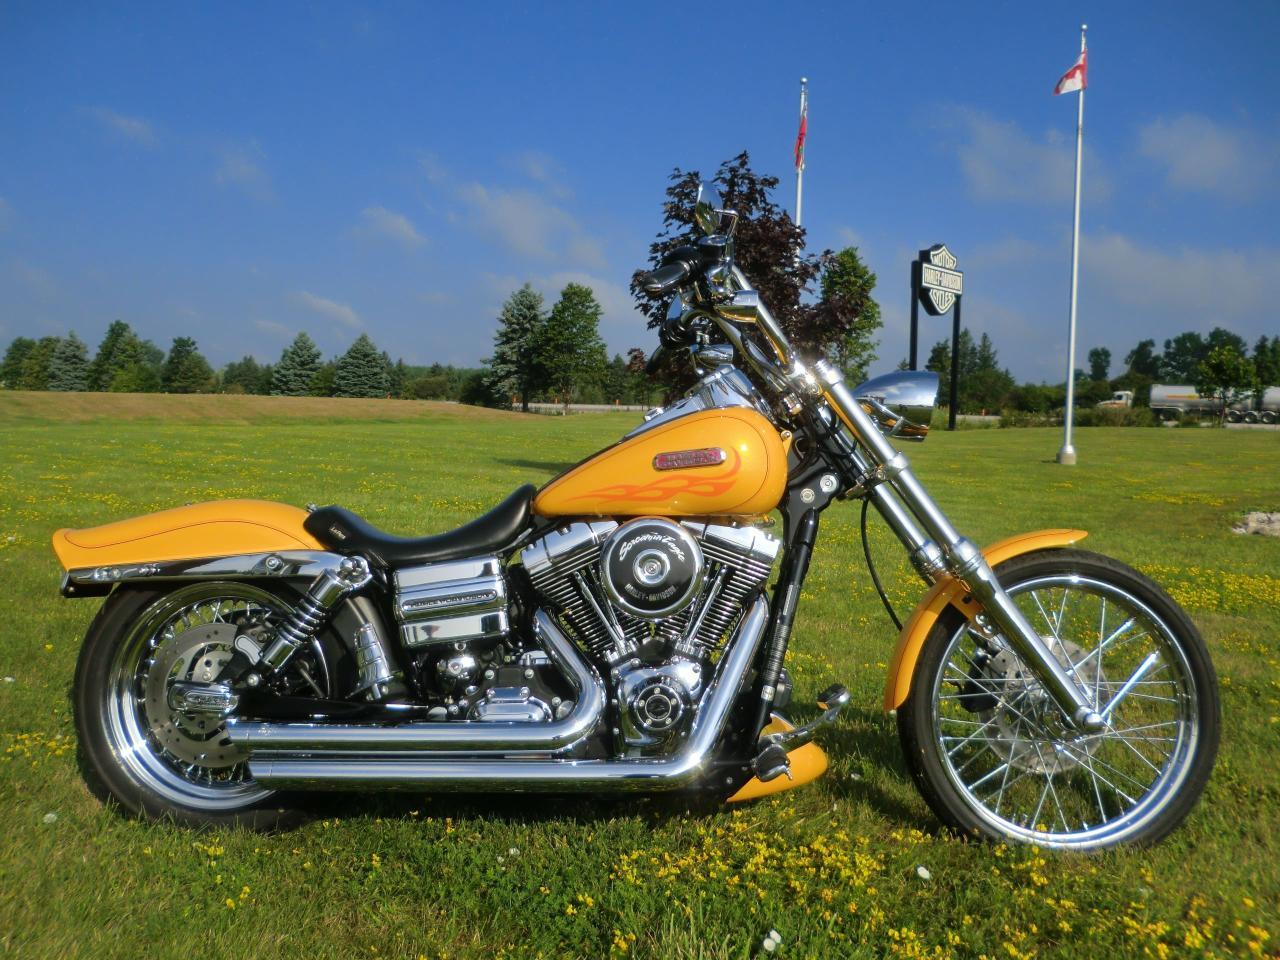 2007 Harley-Davidson Wide Glide FXDWG DYNA WIDEGLIDE